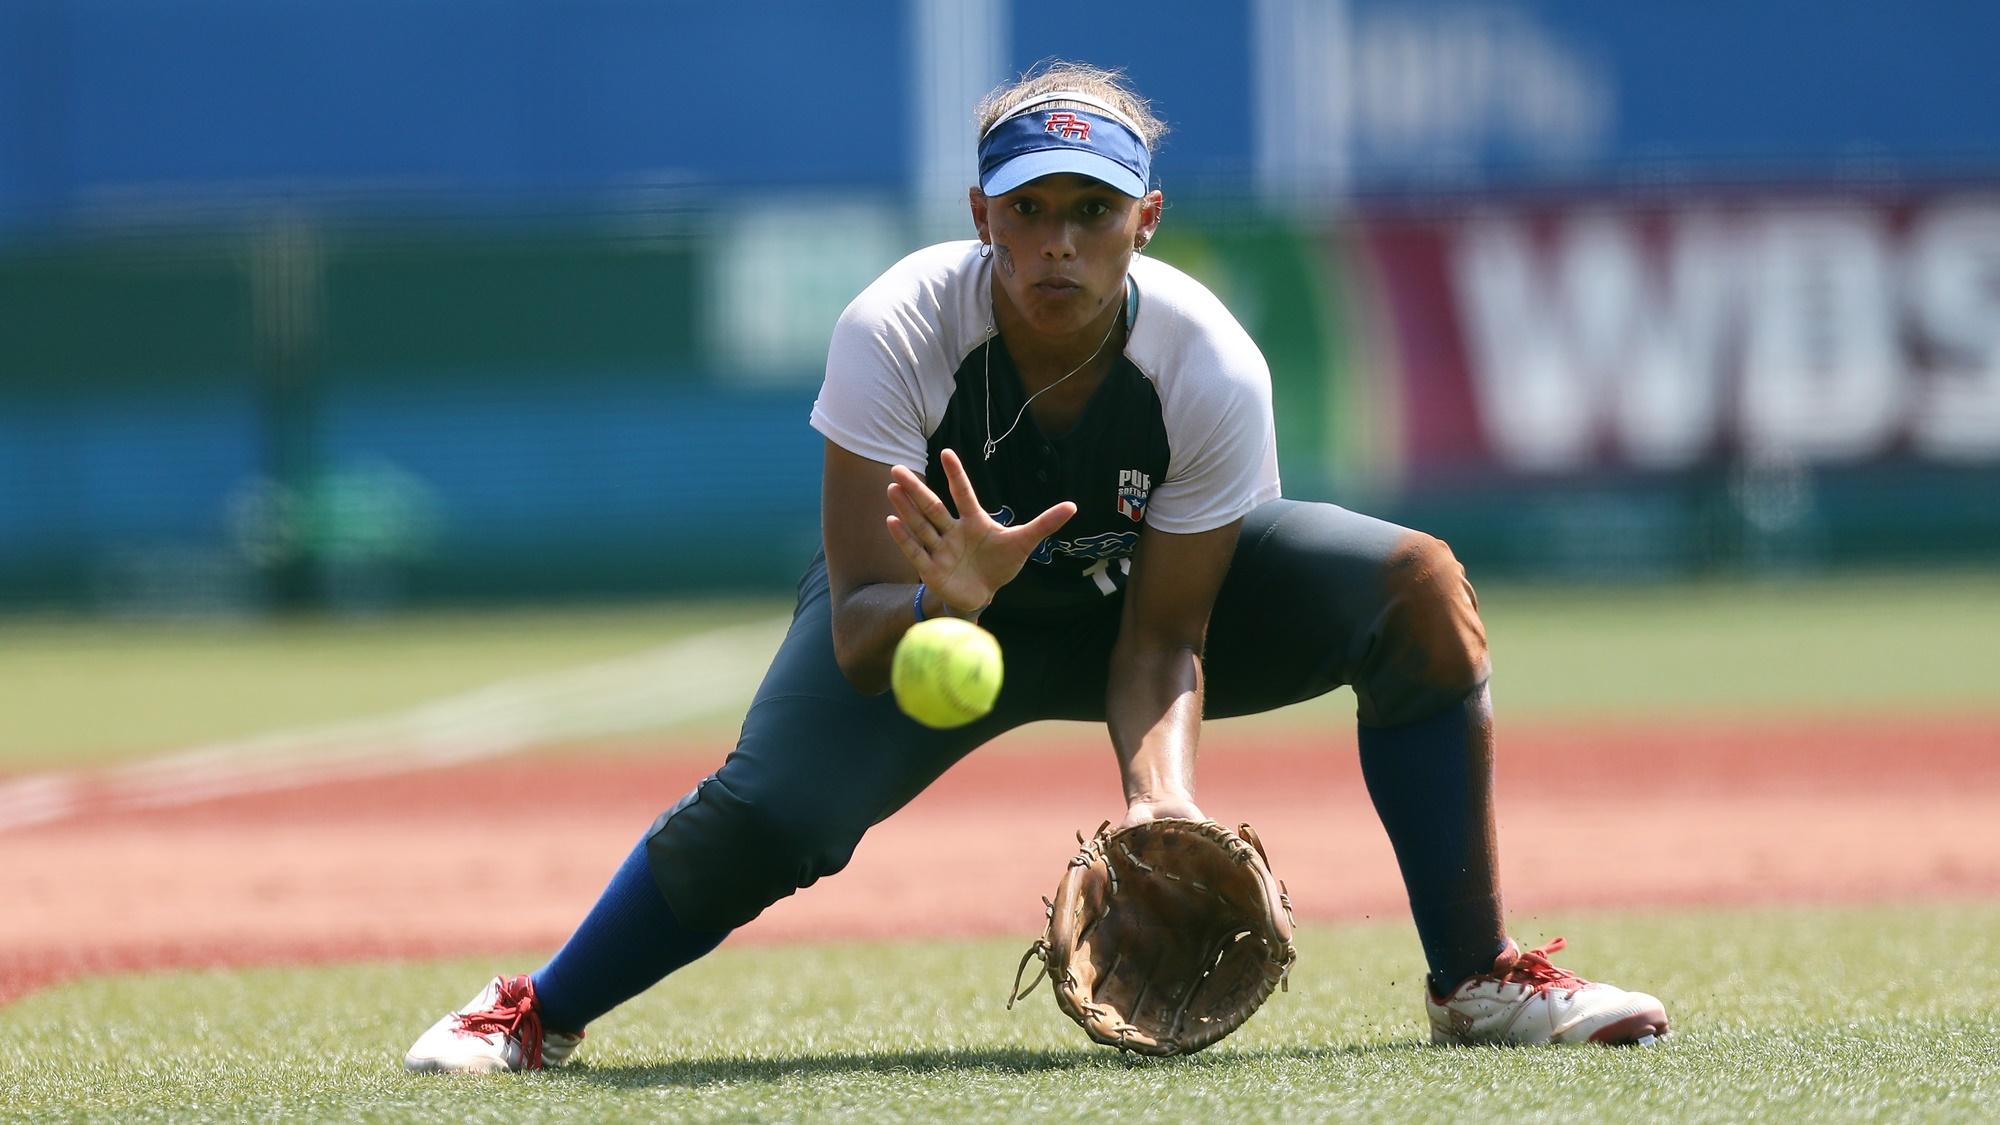 Quianna Diaz fields third for Puerto Rico